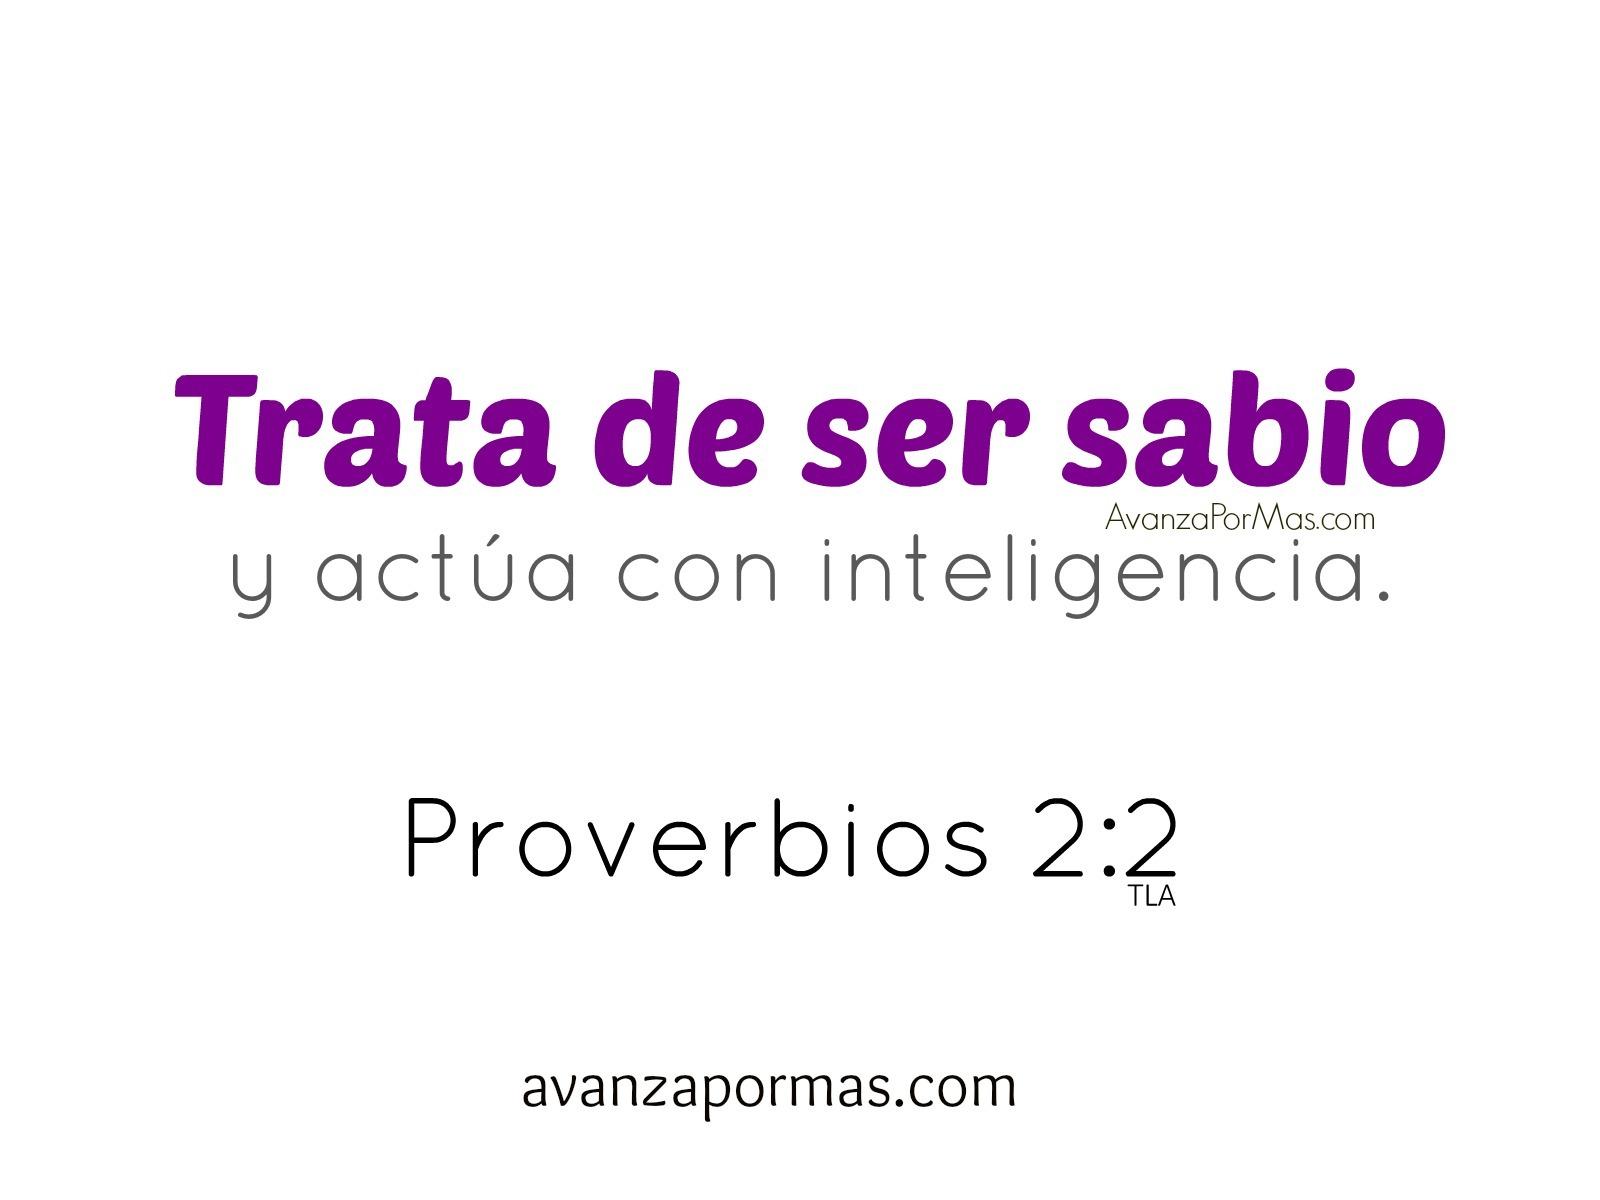 proverbios 2